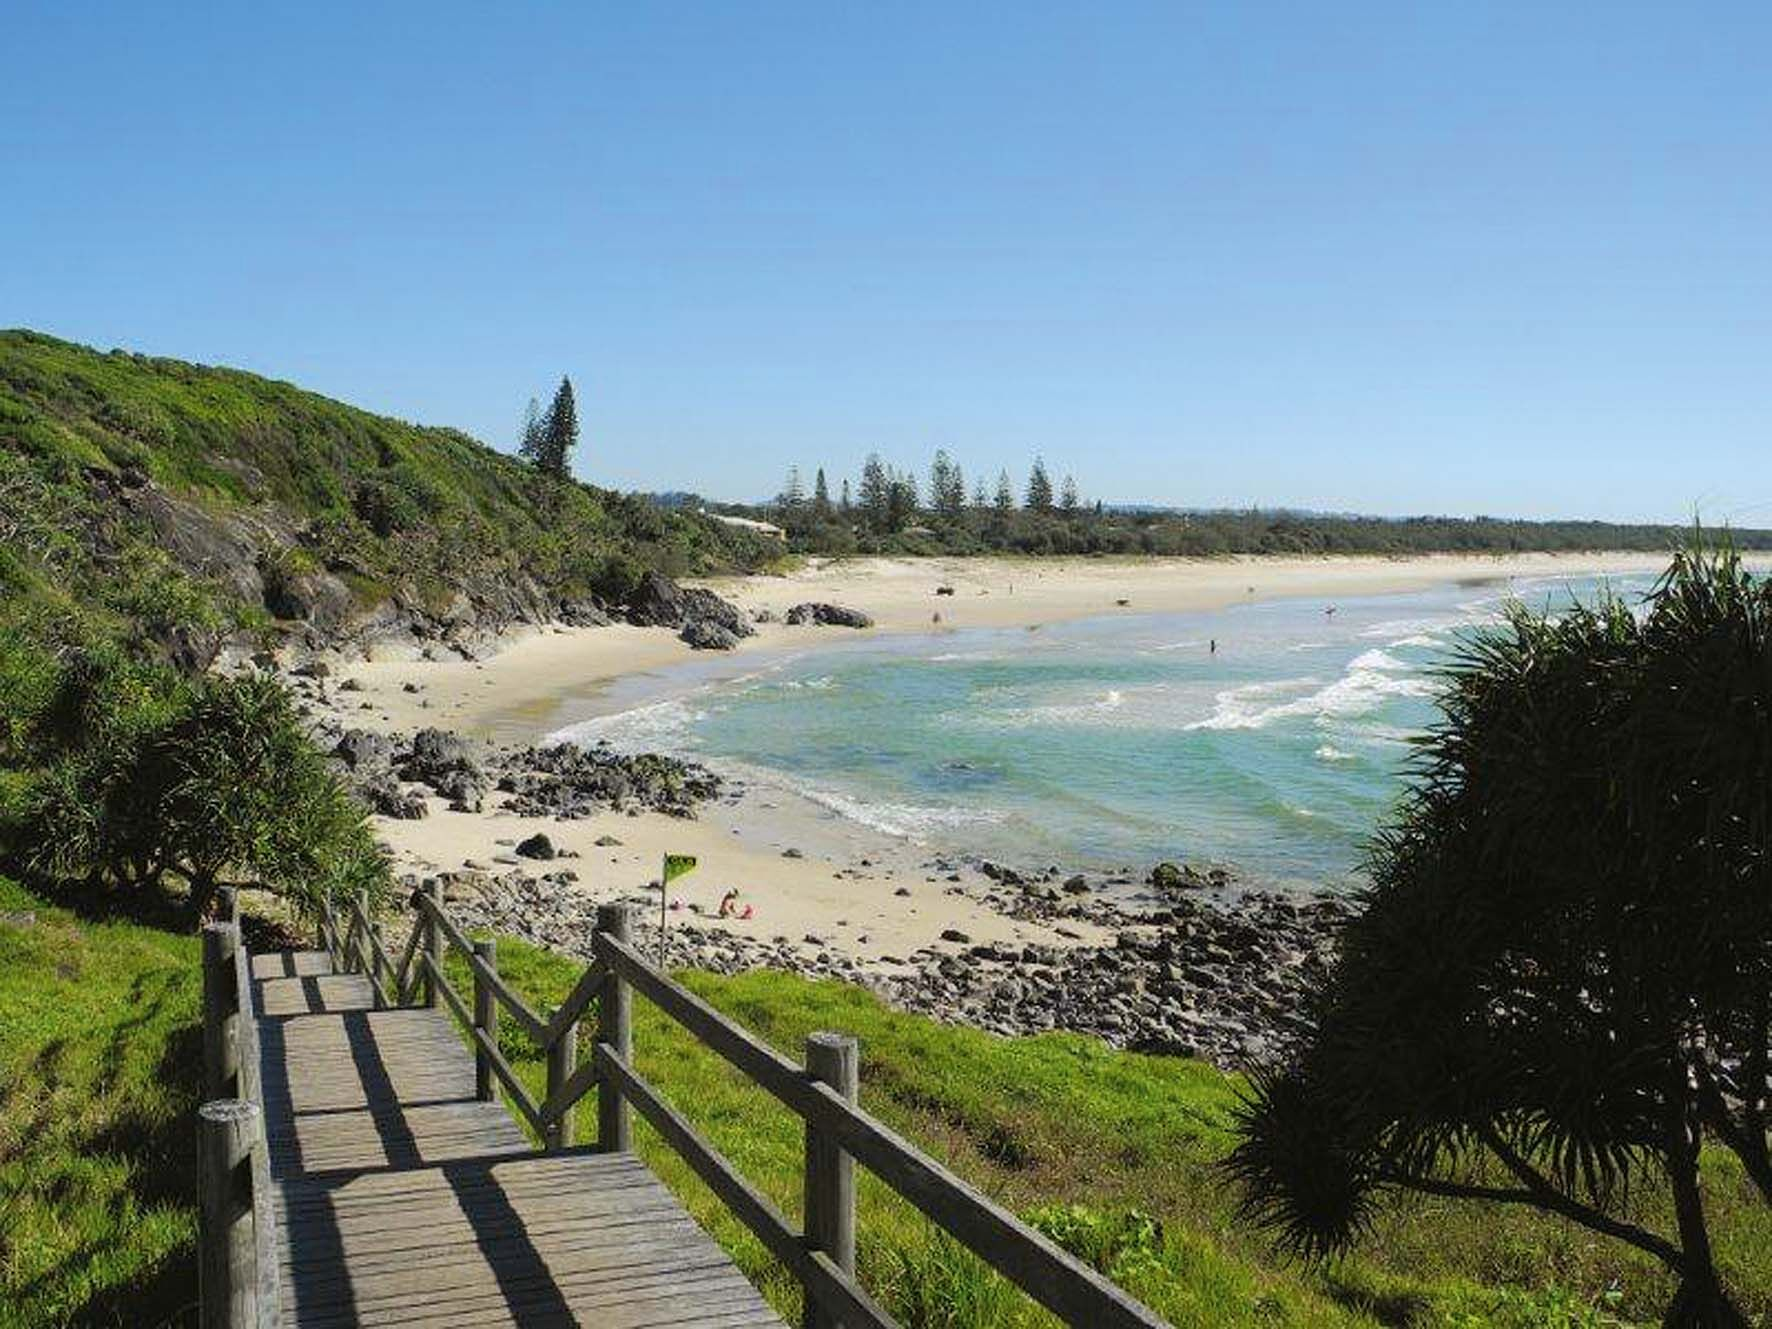 Plage de Cabarita Australie - Brad Farmer